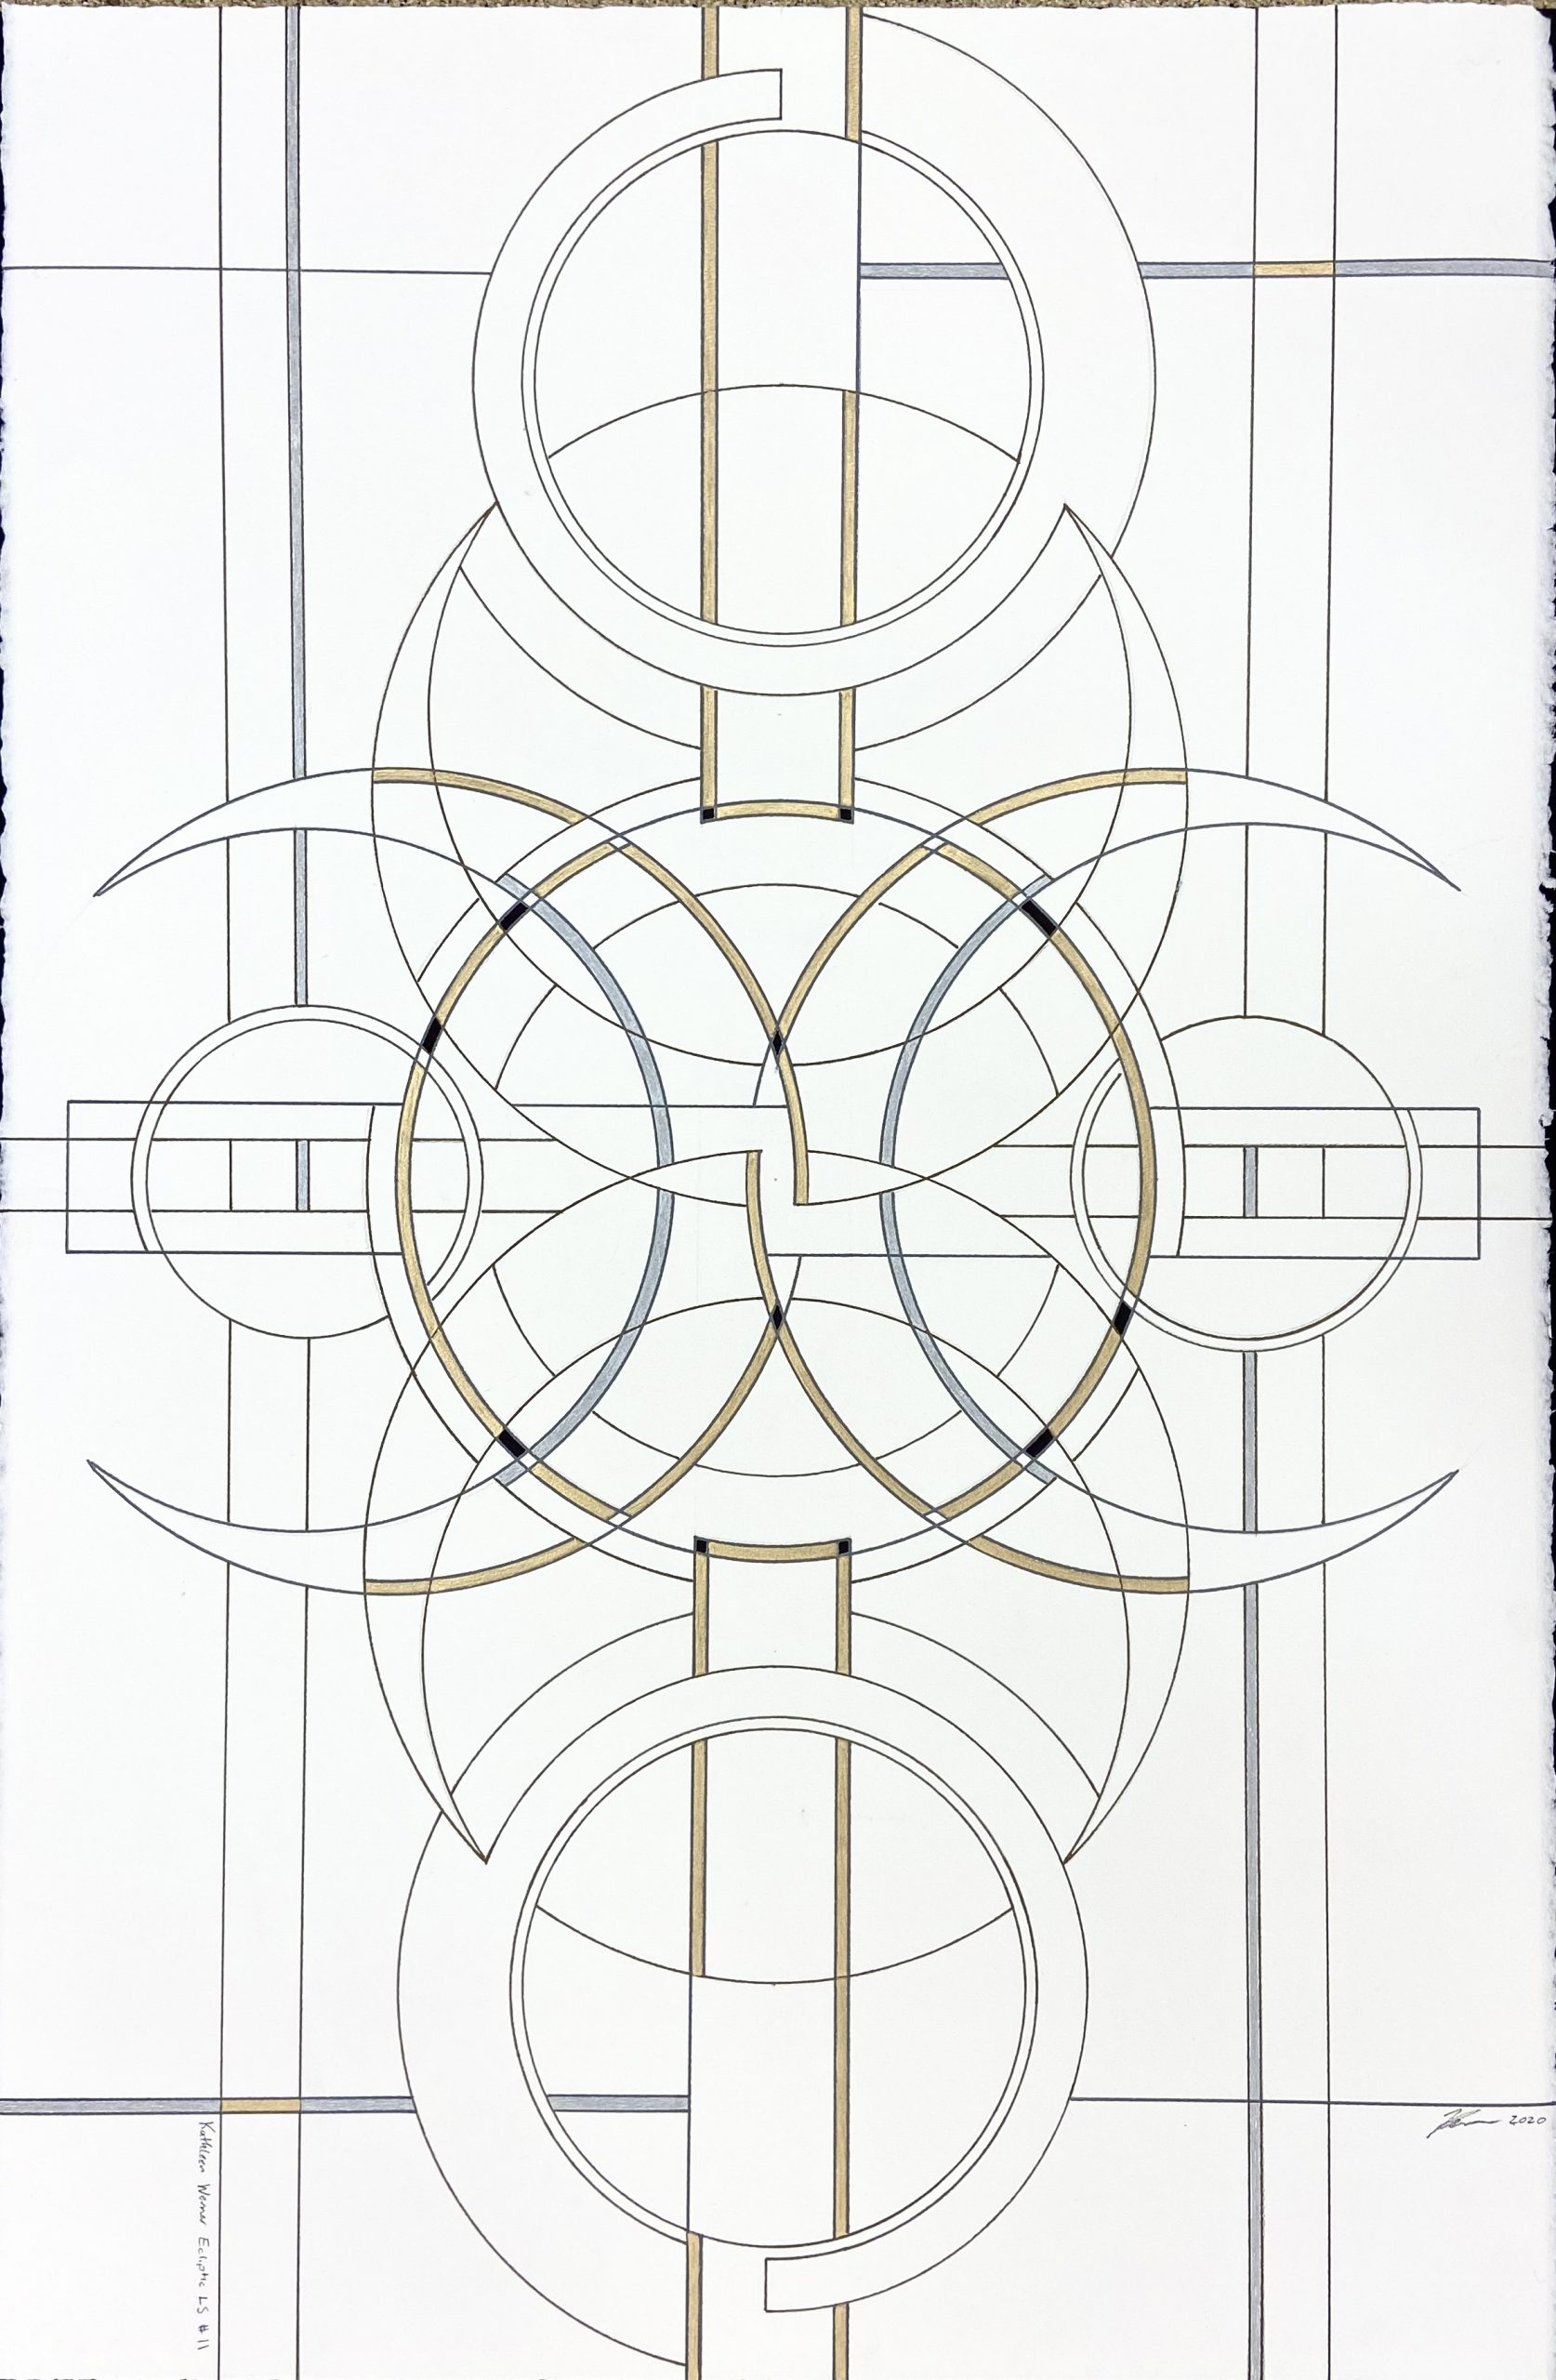 Ecliptic Line Study #11